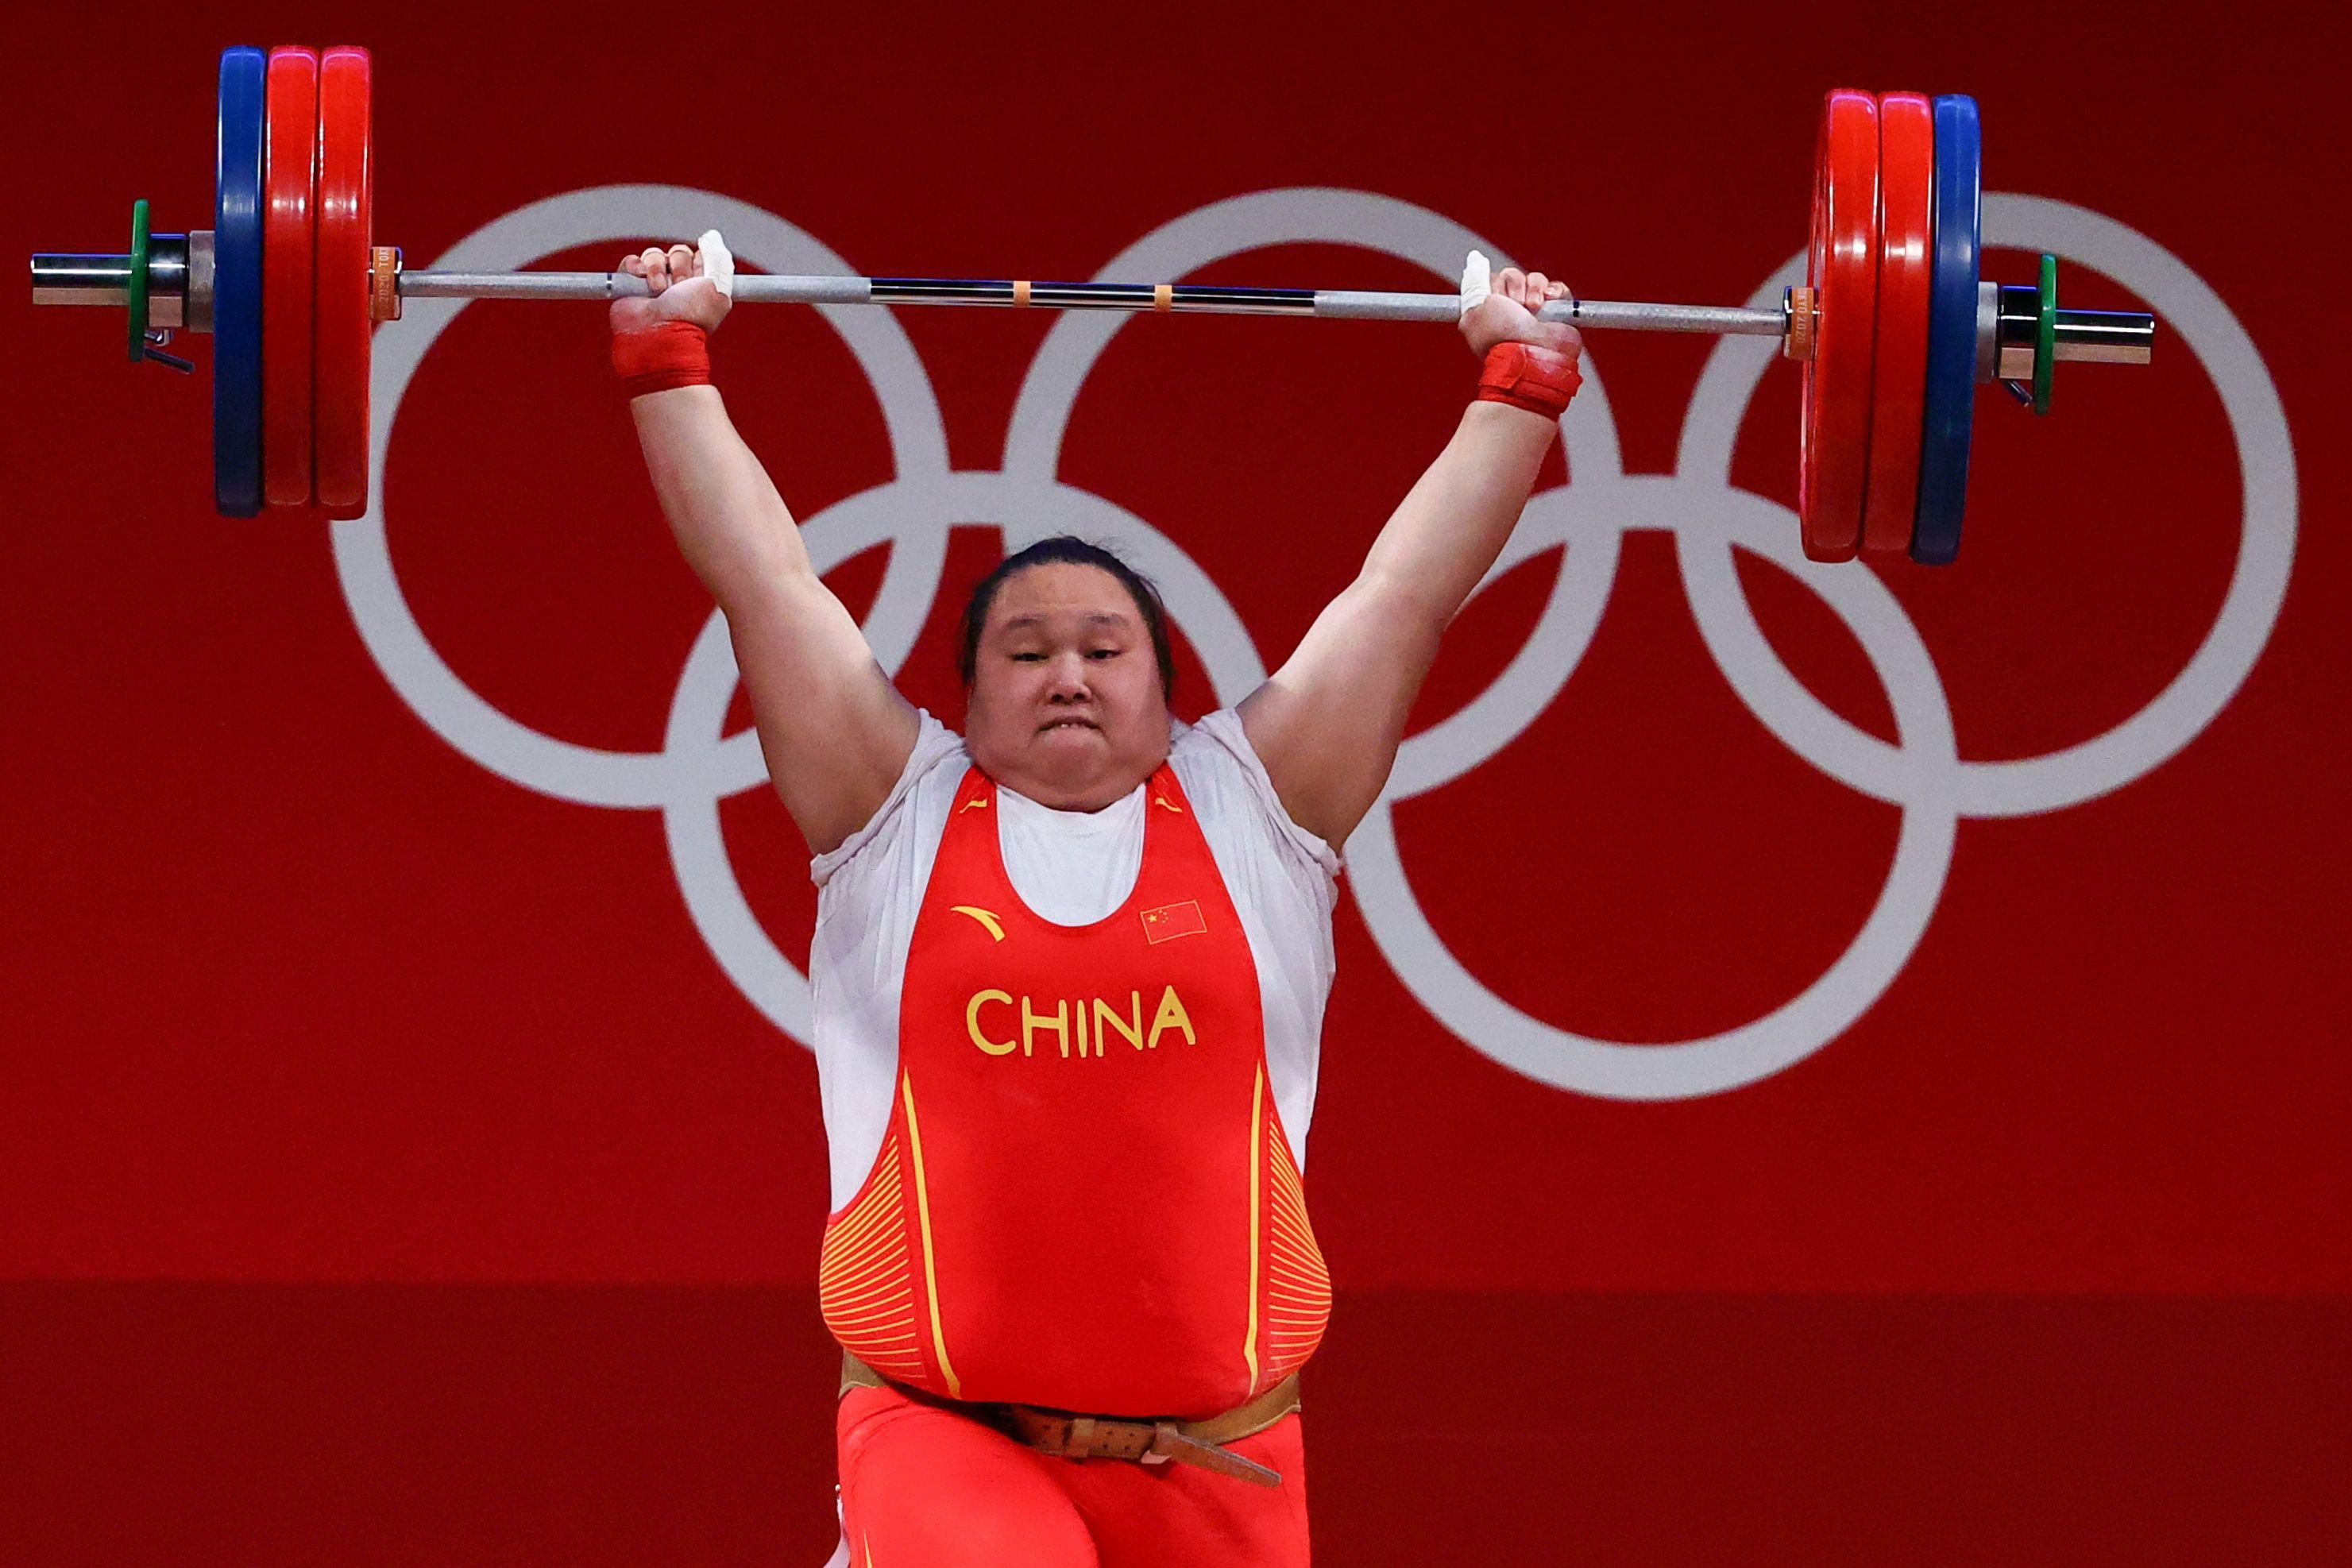 Tokyo 2020 Olympics - Weightlifting - Women's +87kg - Group A - Tokyo International Forum, Tokyo, Japan - August 2, 2021. Li Wenwen of China in action. REUTERS/Edgard Garrido